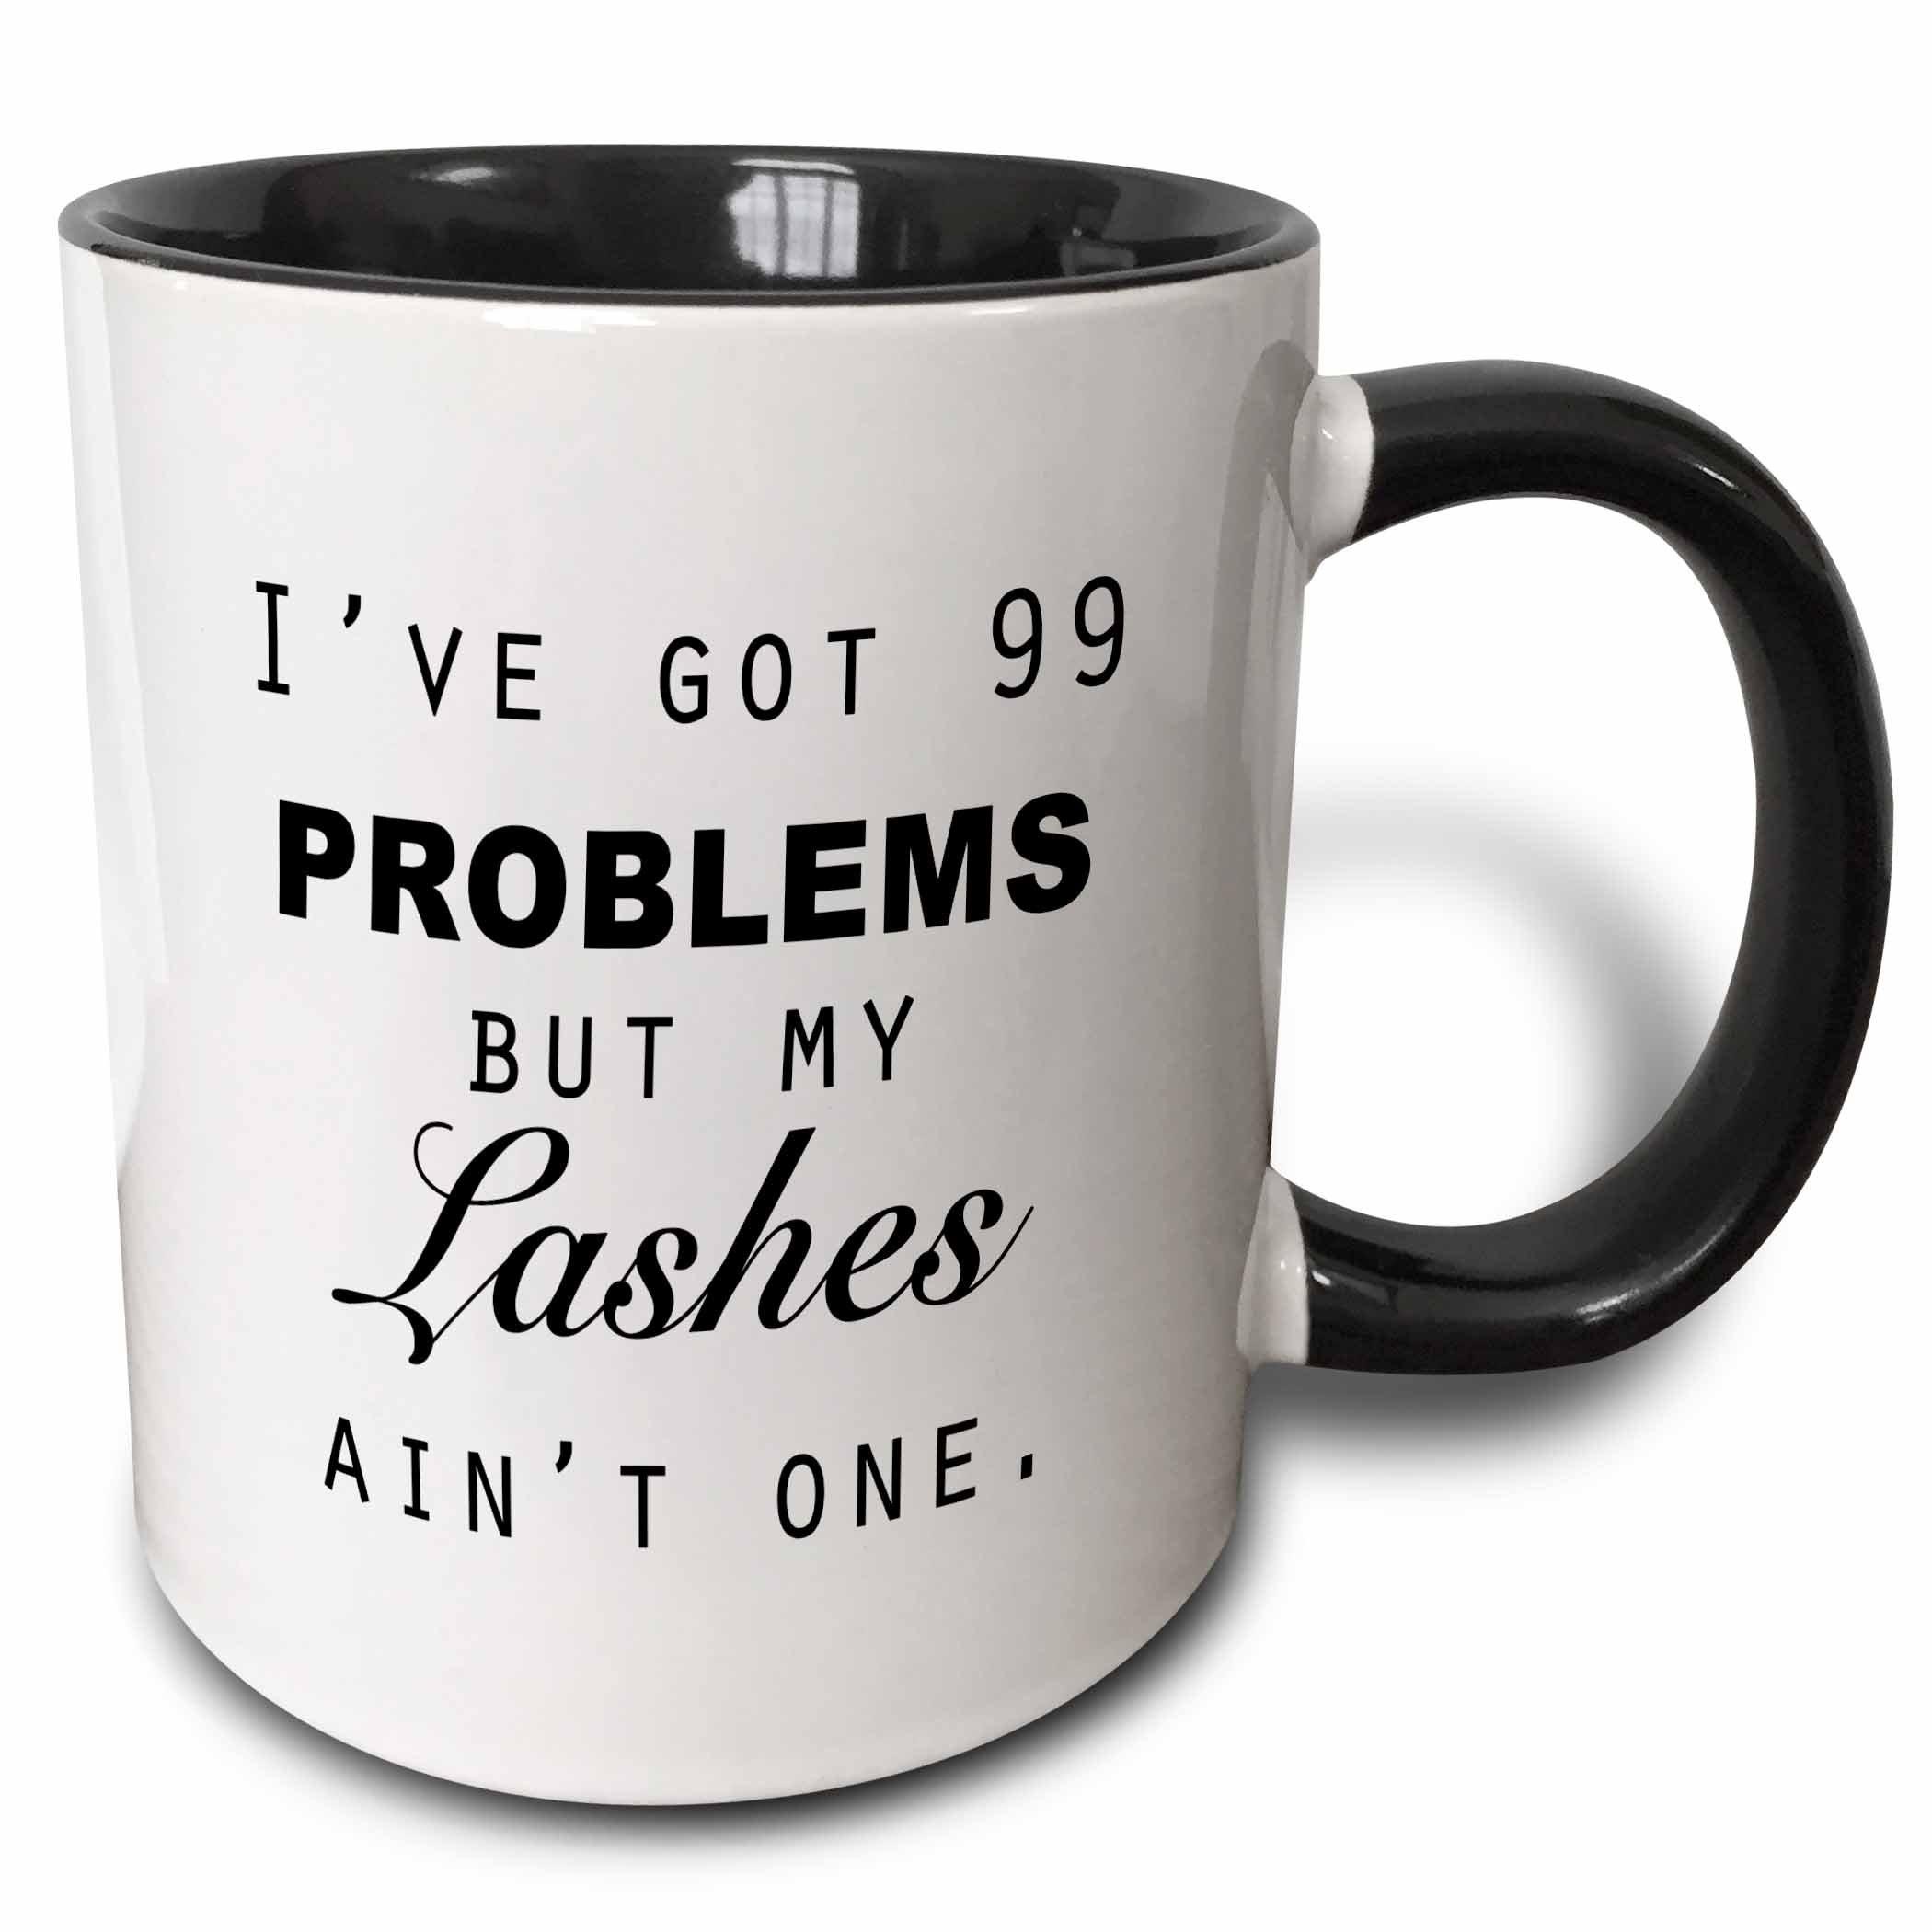 "3dRose 223170_4""IVE GOT 99 PROBLEMS BUT MY LASHES AINT ONE. Two Tone Mug, 11 oz, Black"